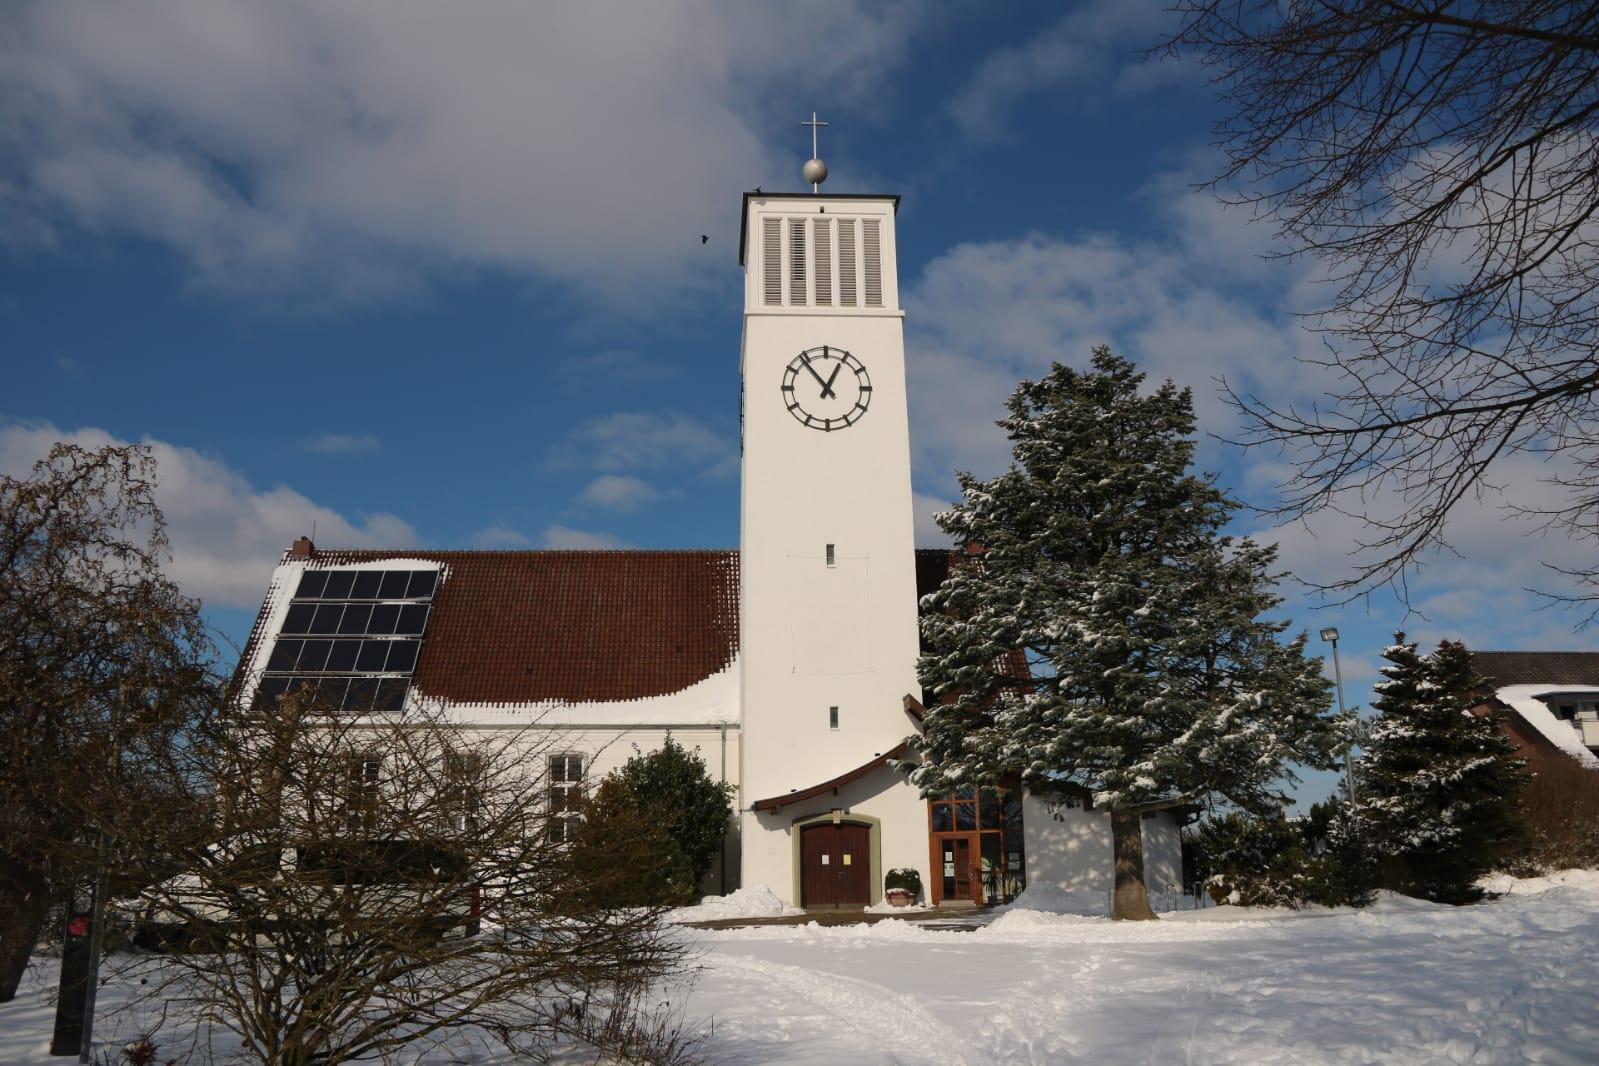 Kirche Sylbach Winter Martina Eikermann 6